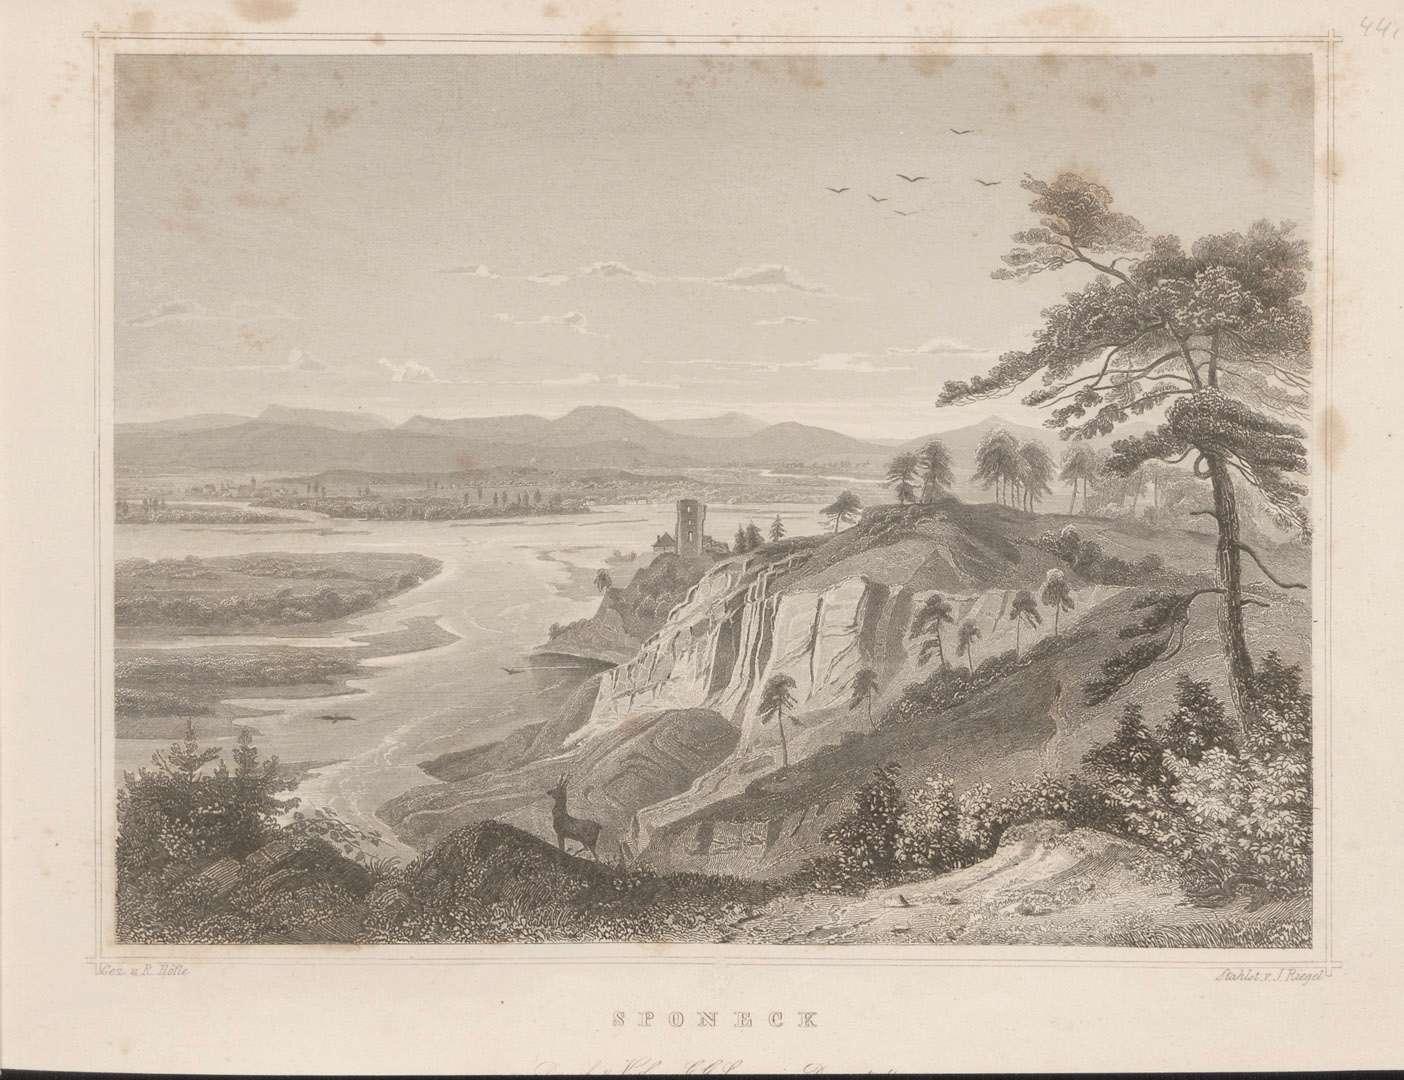 Sponeck, Bild 1